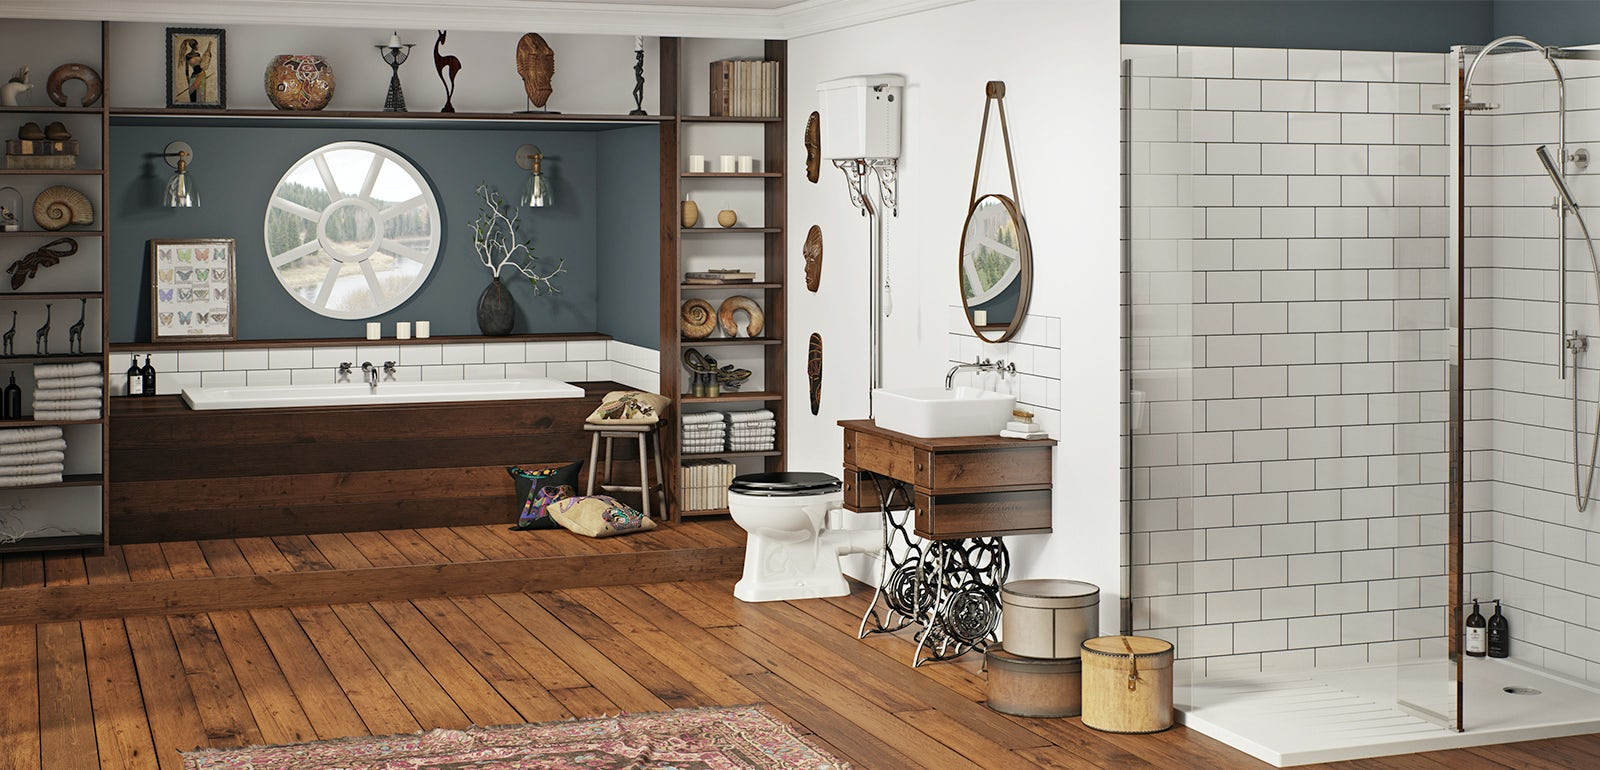 Bathroom ideas: Objects of Desire